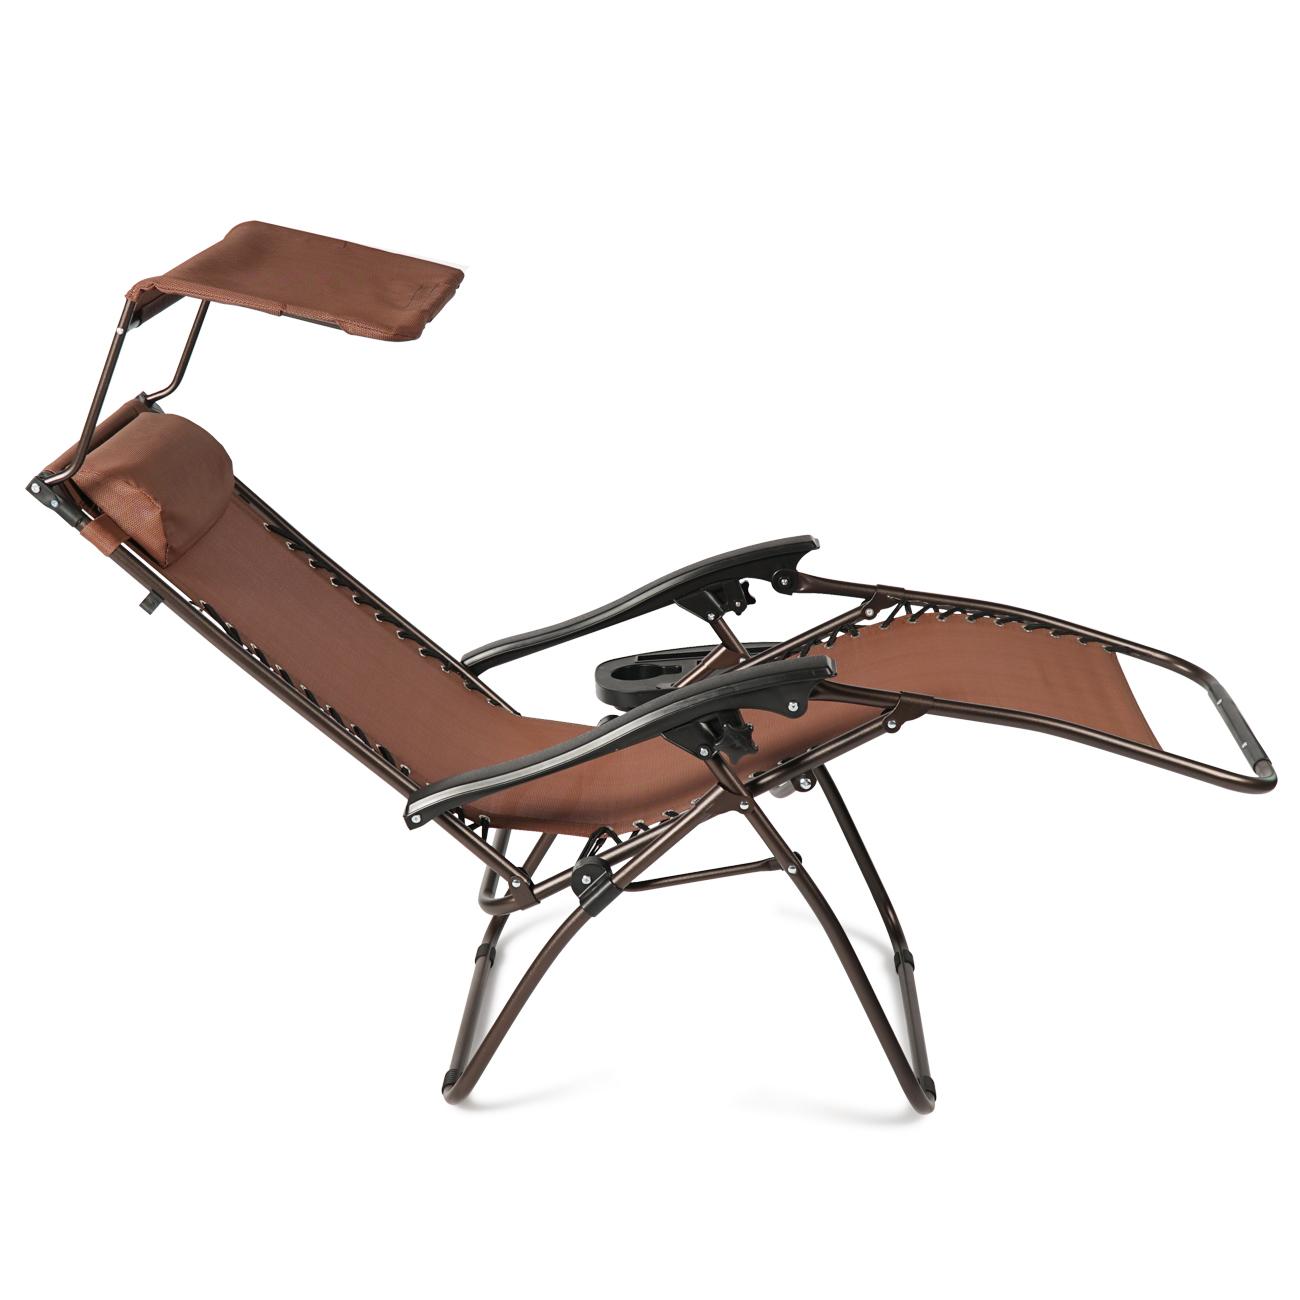 NEW Zero Gravity Folding Lounge Beach Chairs W